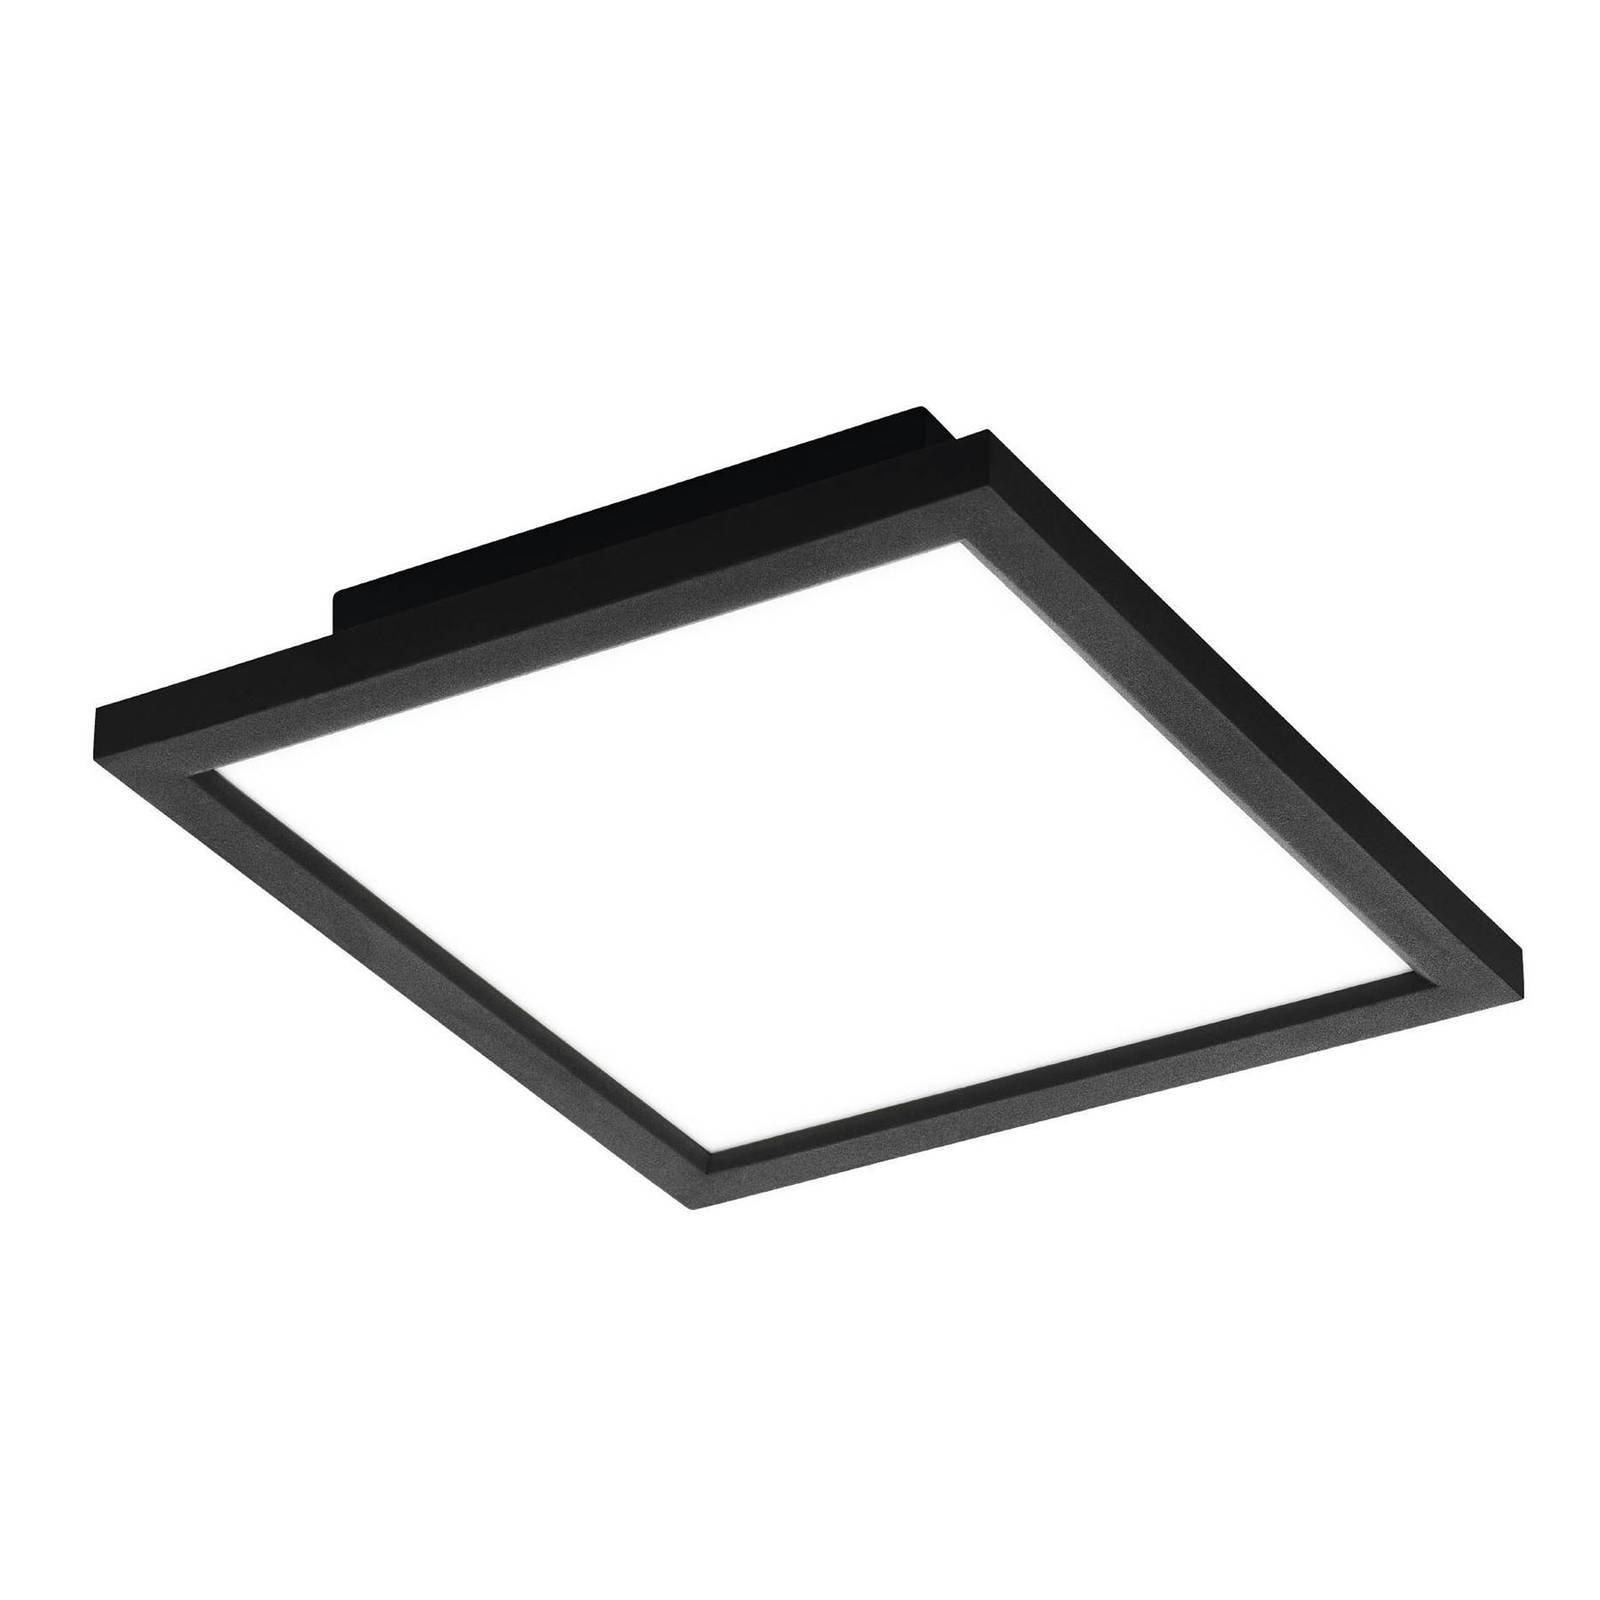 EGLO connect Salobrena-C LED-panel, svart 30x30 cm